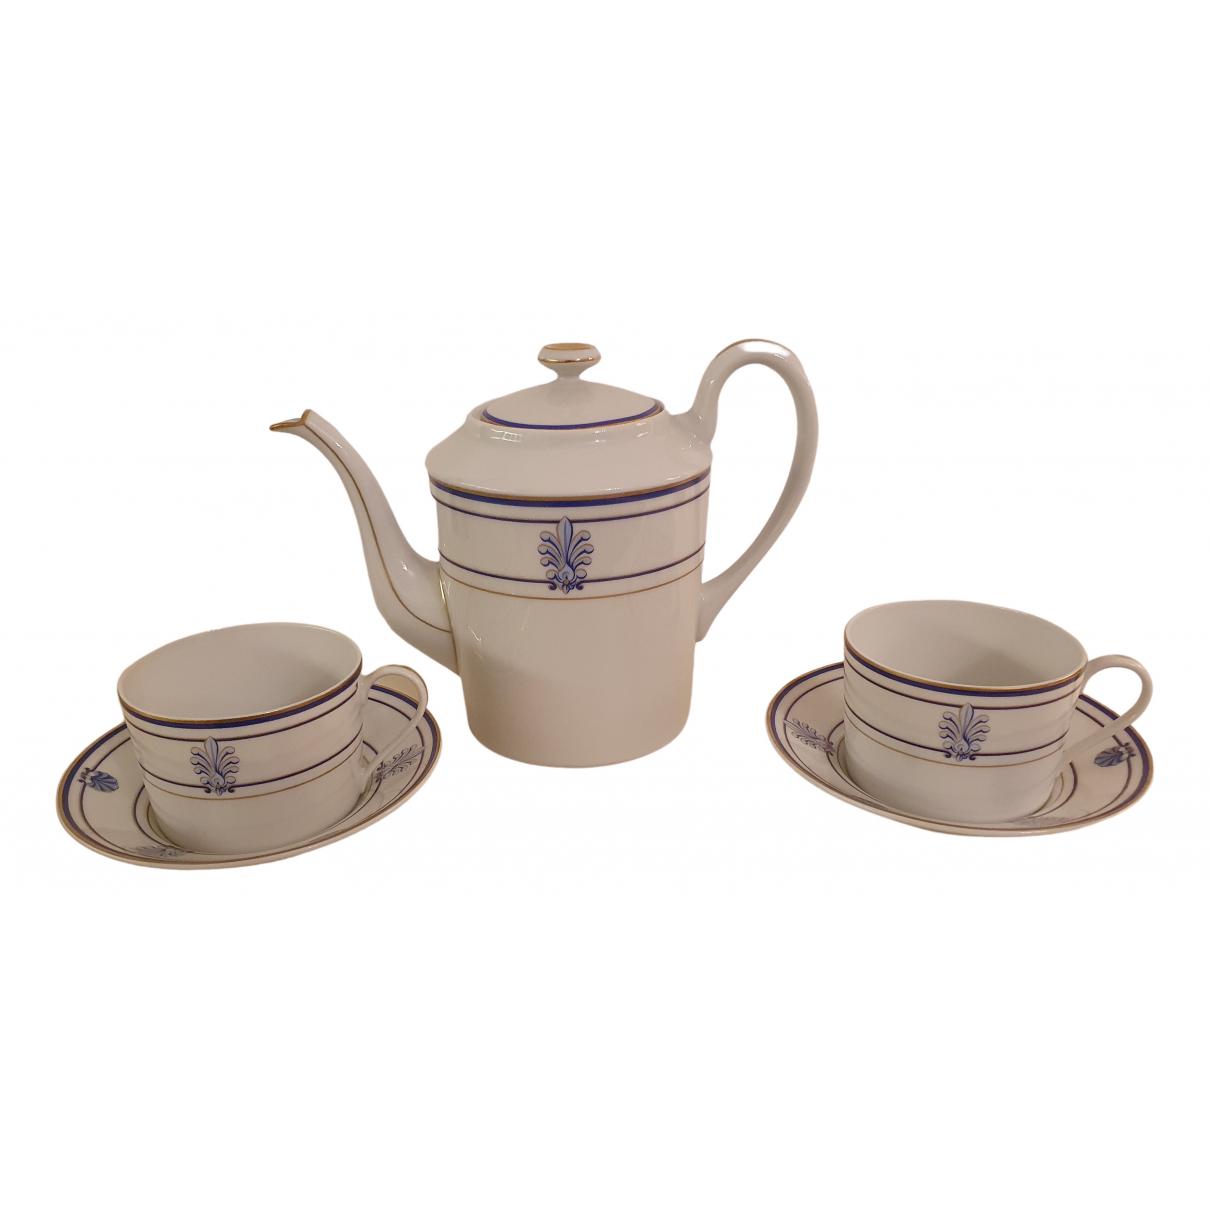 Juego de te/cafe de Porcelana Tiffany & Co